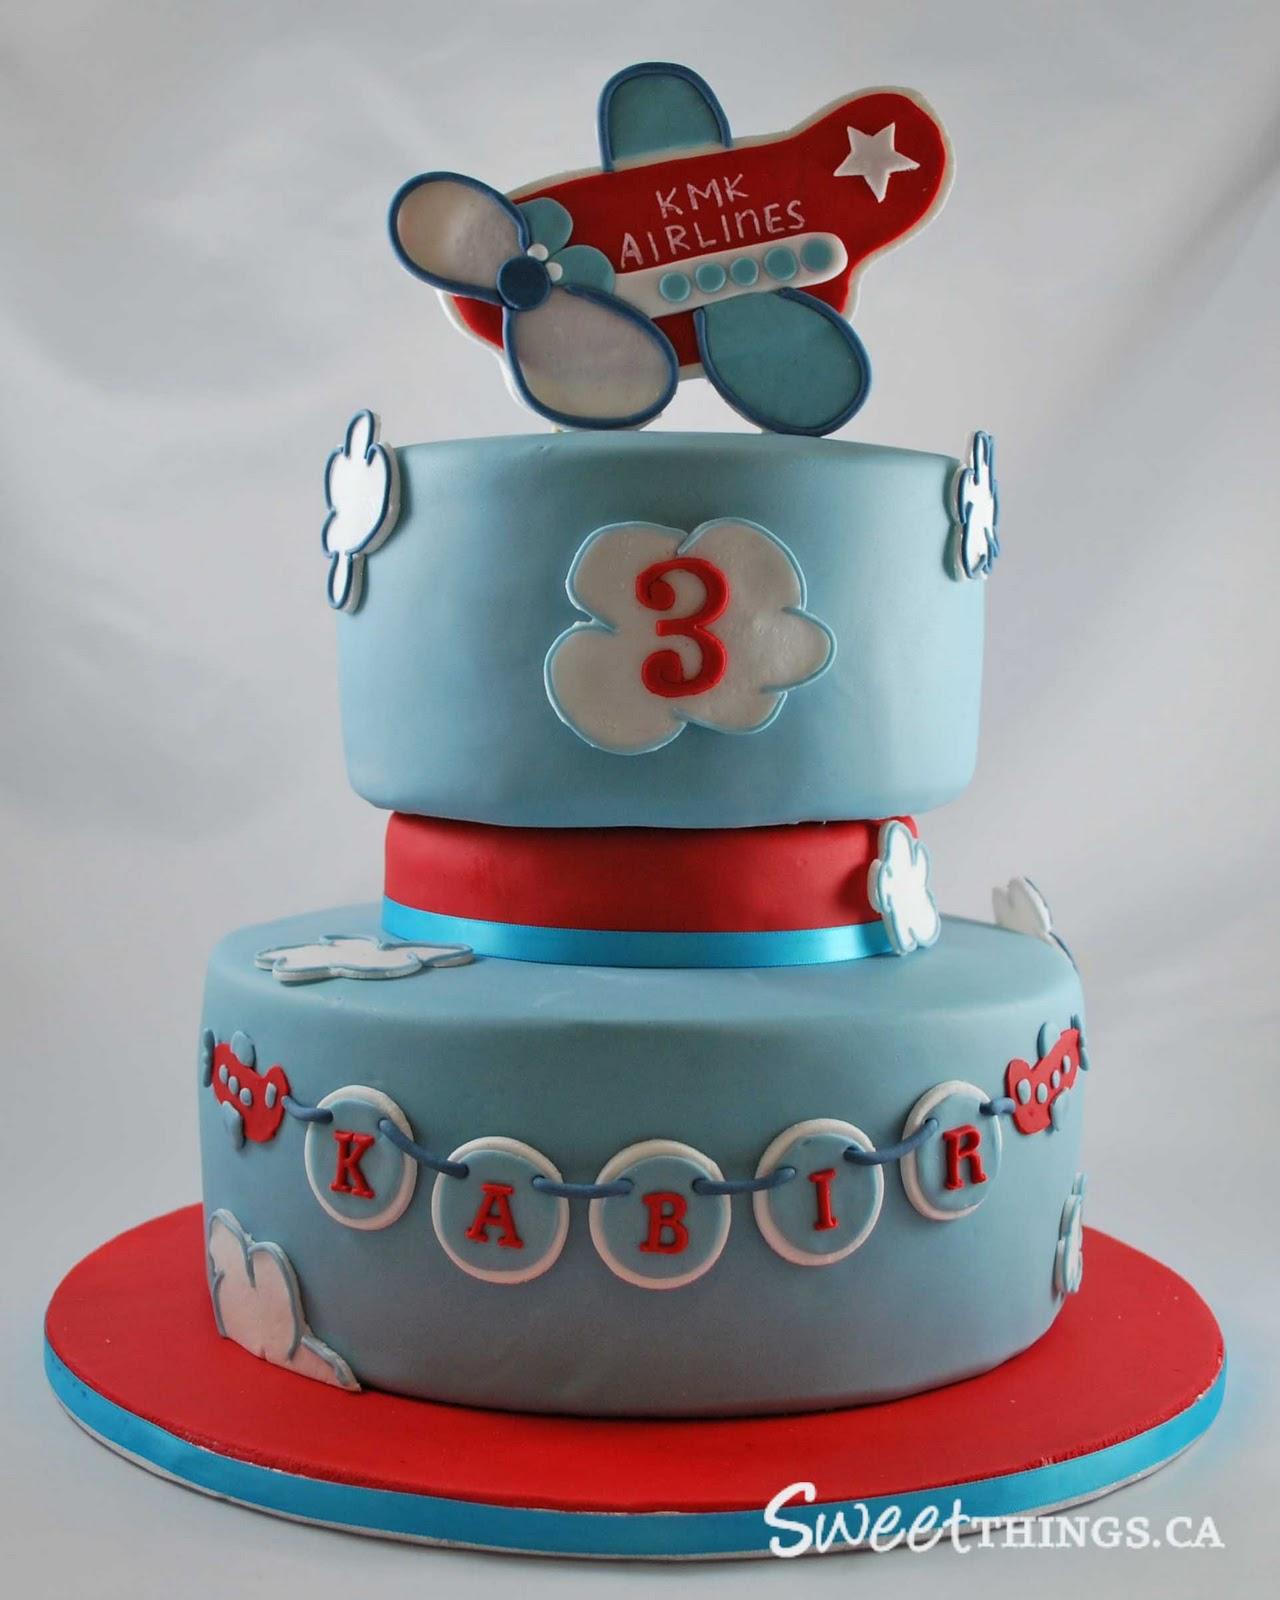 Sweetthings 3rd Birthday Cake Cute Airplane Cake